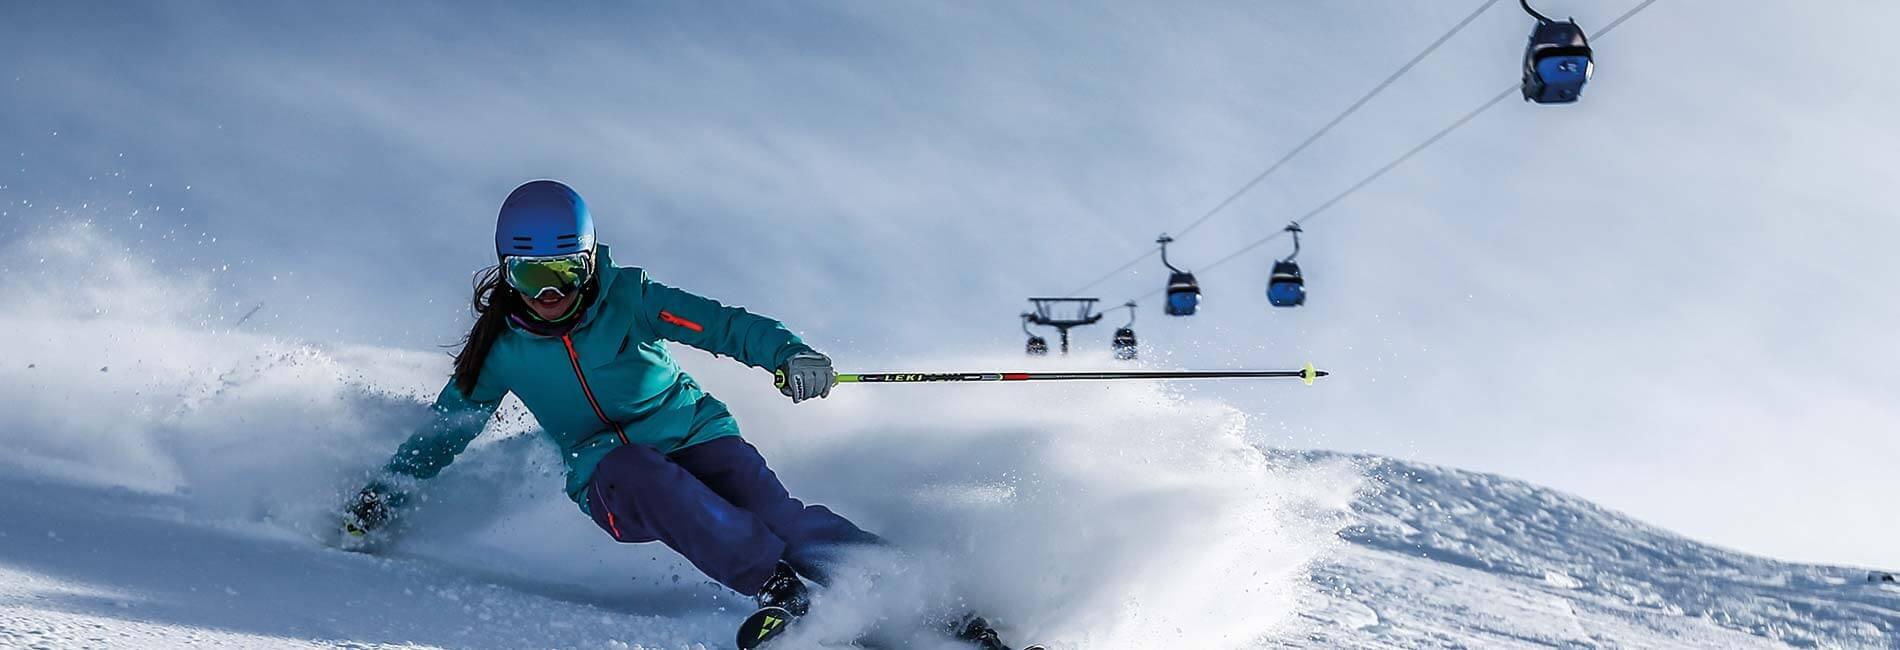 Lifte in Betrieb Skiurlaub in Obergurgl-Hochgurgl und Sölden